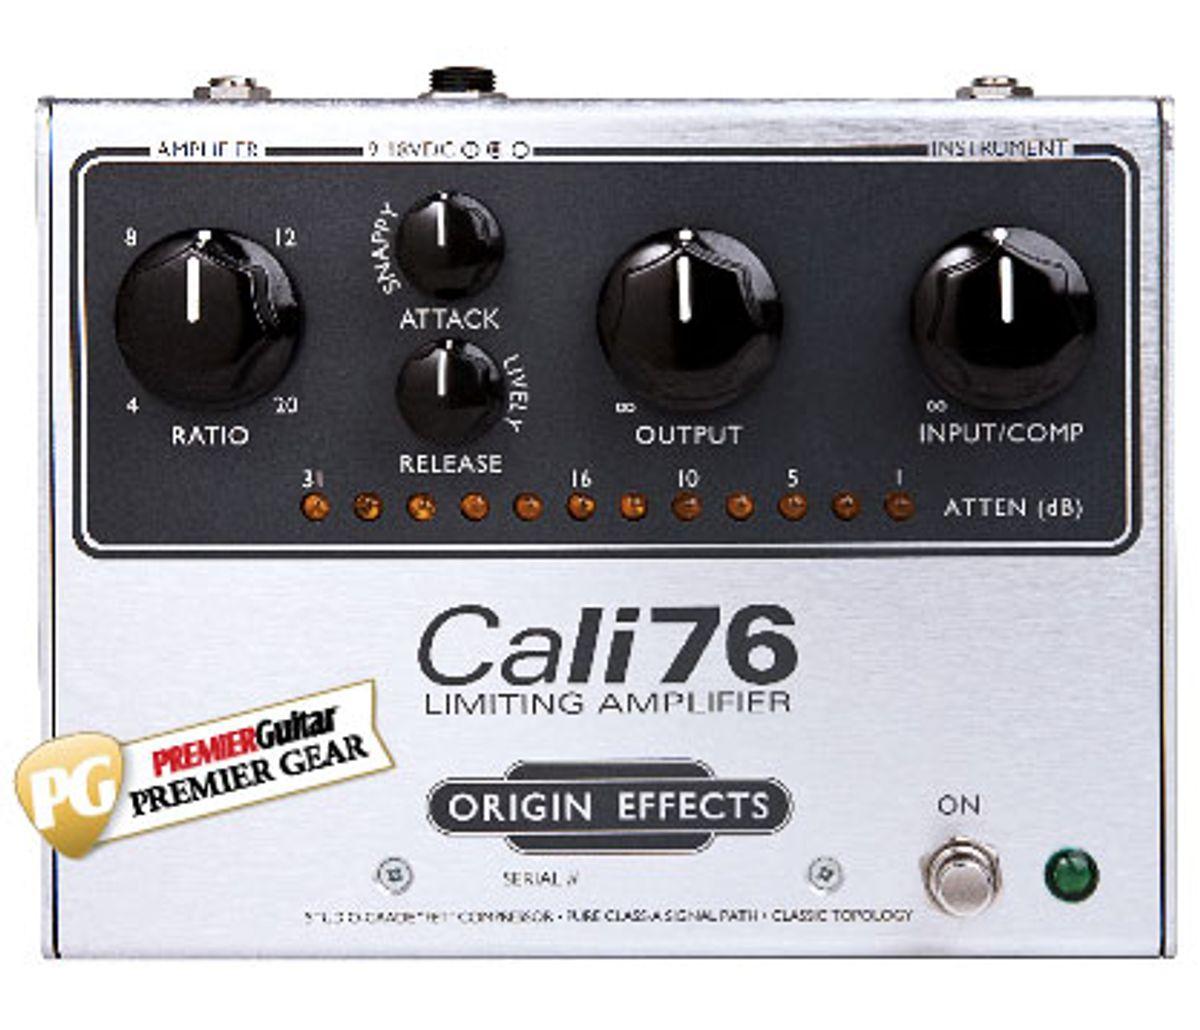 Origin Effects Cali76 Limiting Amplifier Review